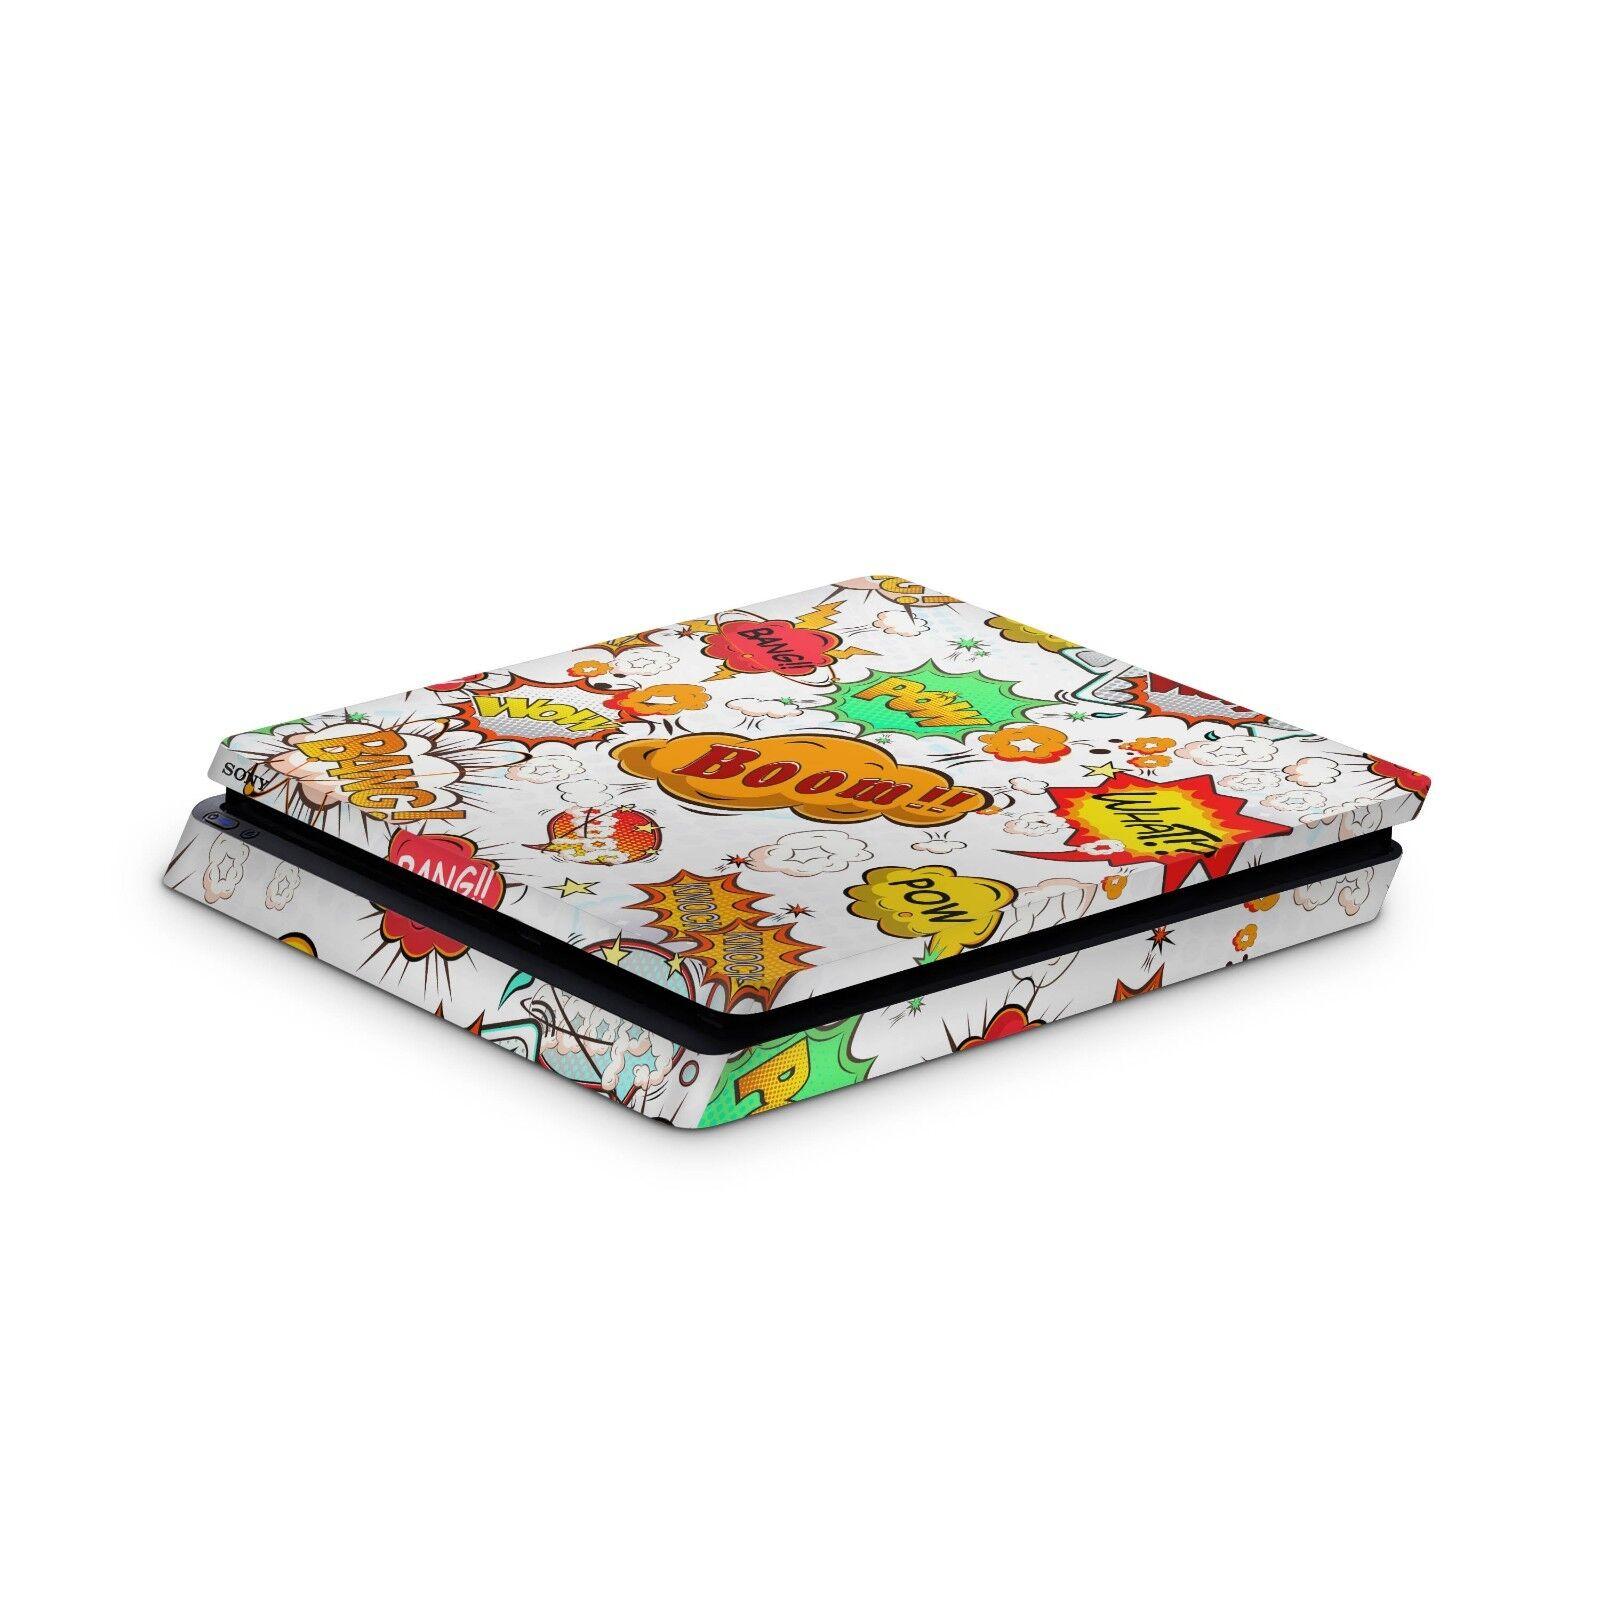 Sony Playstation 4 Slim Aufkleber PS4 Skin Design Sticker Skins Comics Weiss